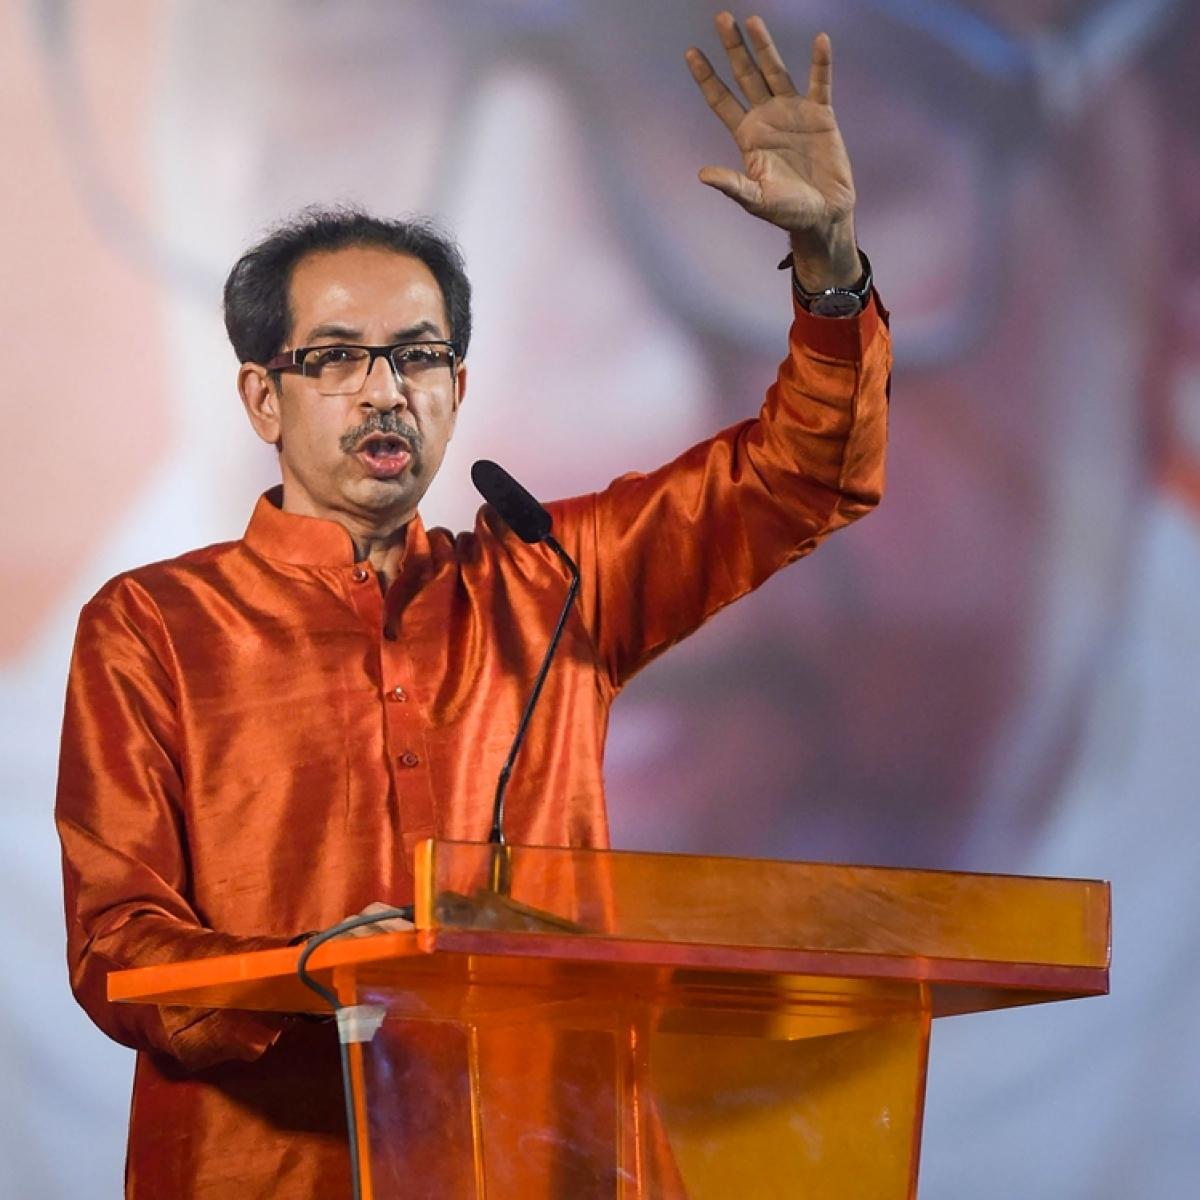 Maha govt formation: Talks are on course, says Shiv Sena